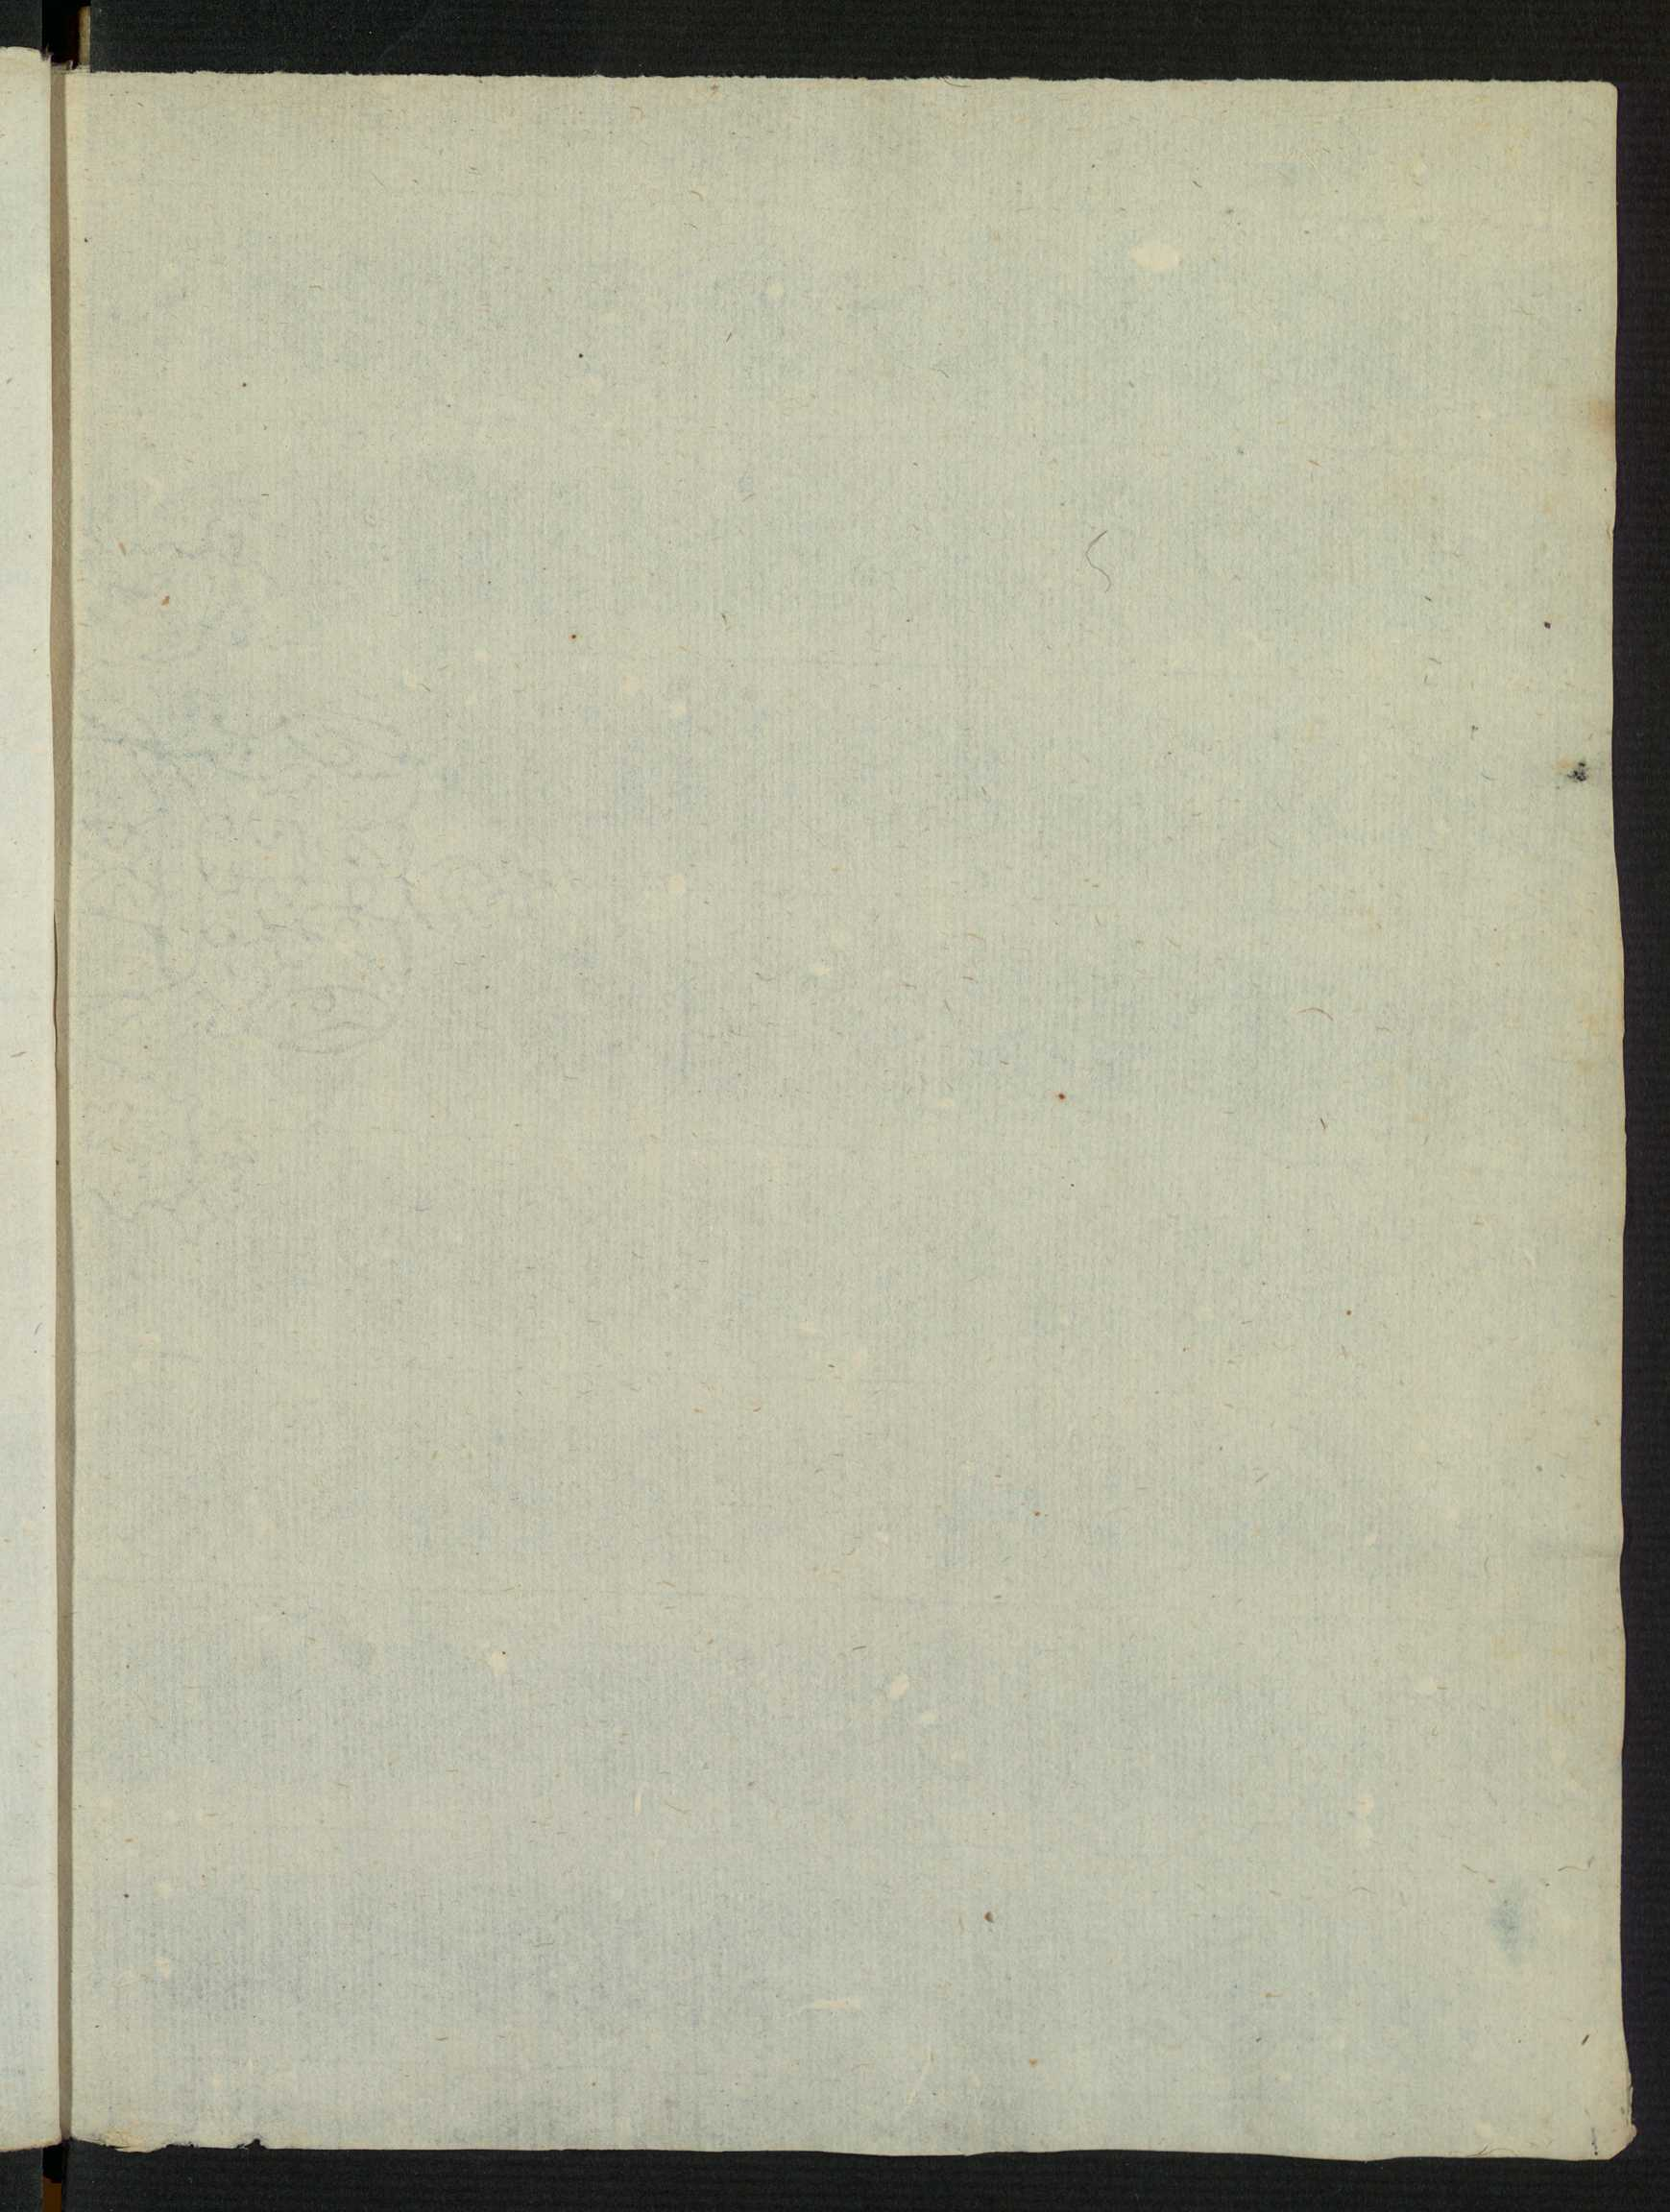 AM 448 4° - 96r